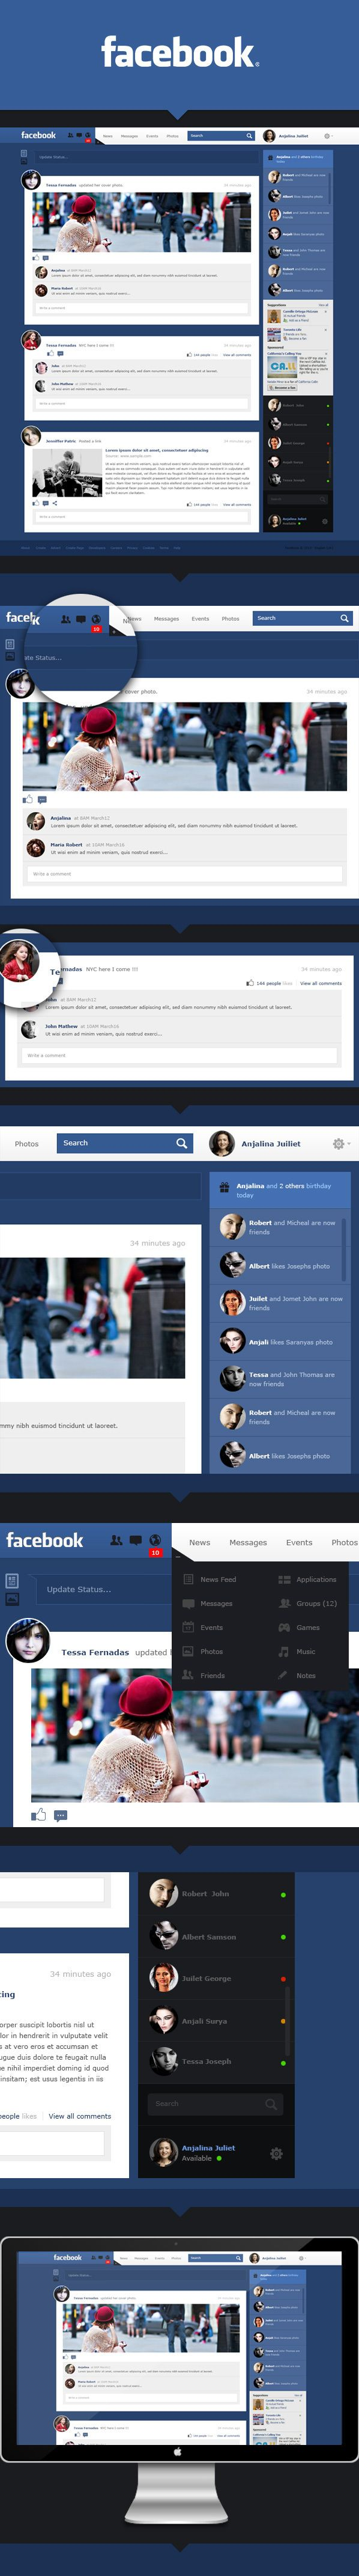 Facebook Redesign Concept by Monish, via Behance